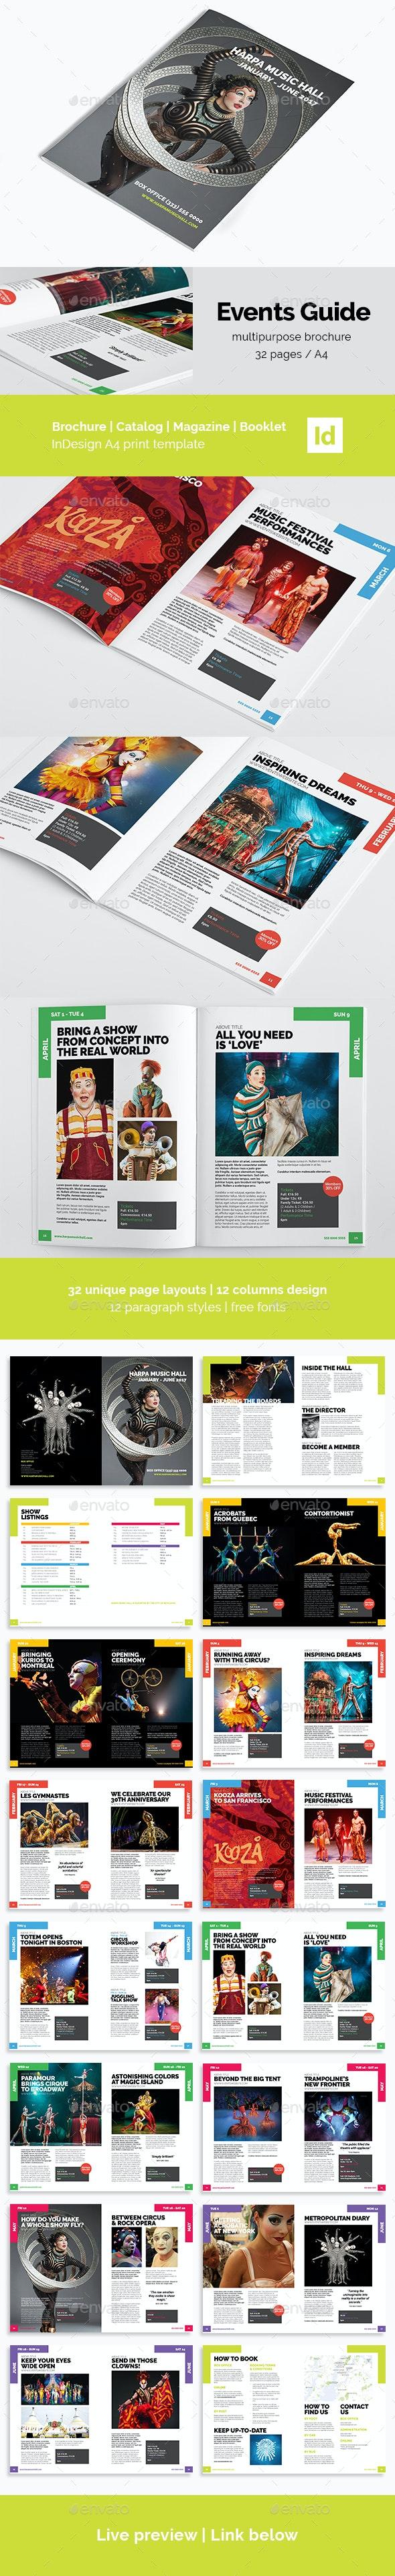 Event Guide | Creative Brochure - Magazines Print Templates